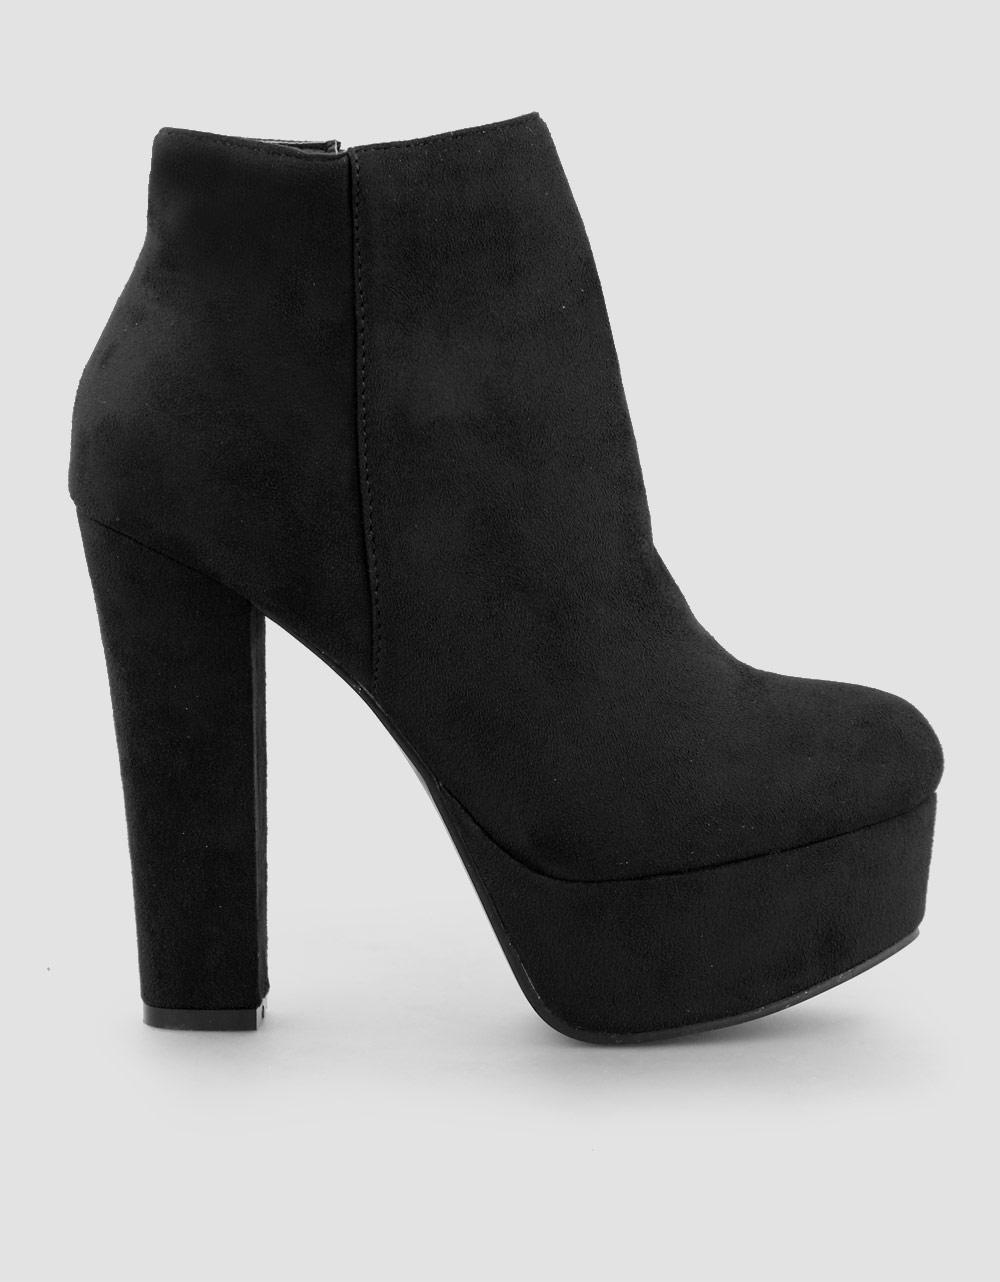 19bdef8bfdf Inshoes.gr. Γυναικεία μποτάκια ψηλοτάκουνα | Inshoes.gr Μαύρο